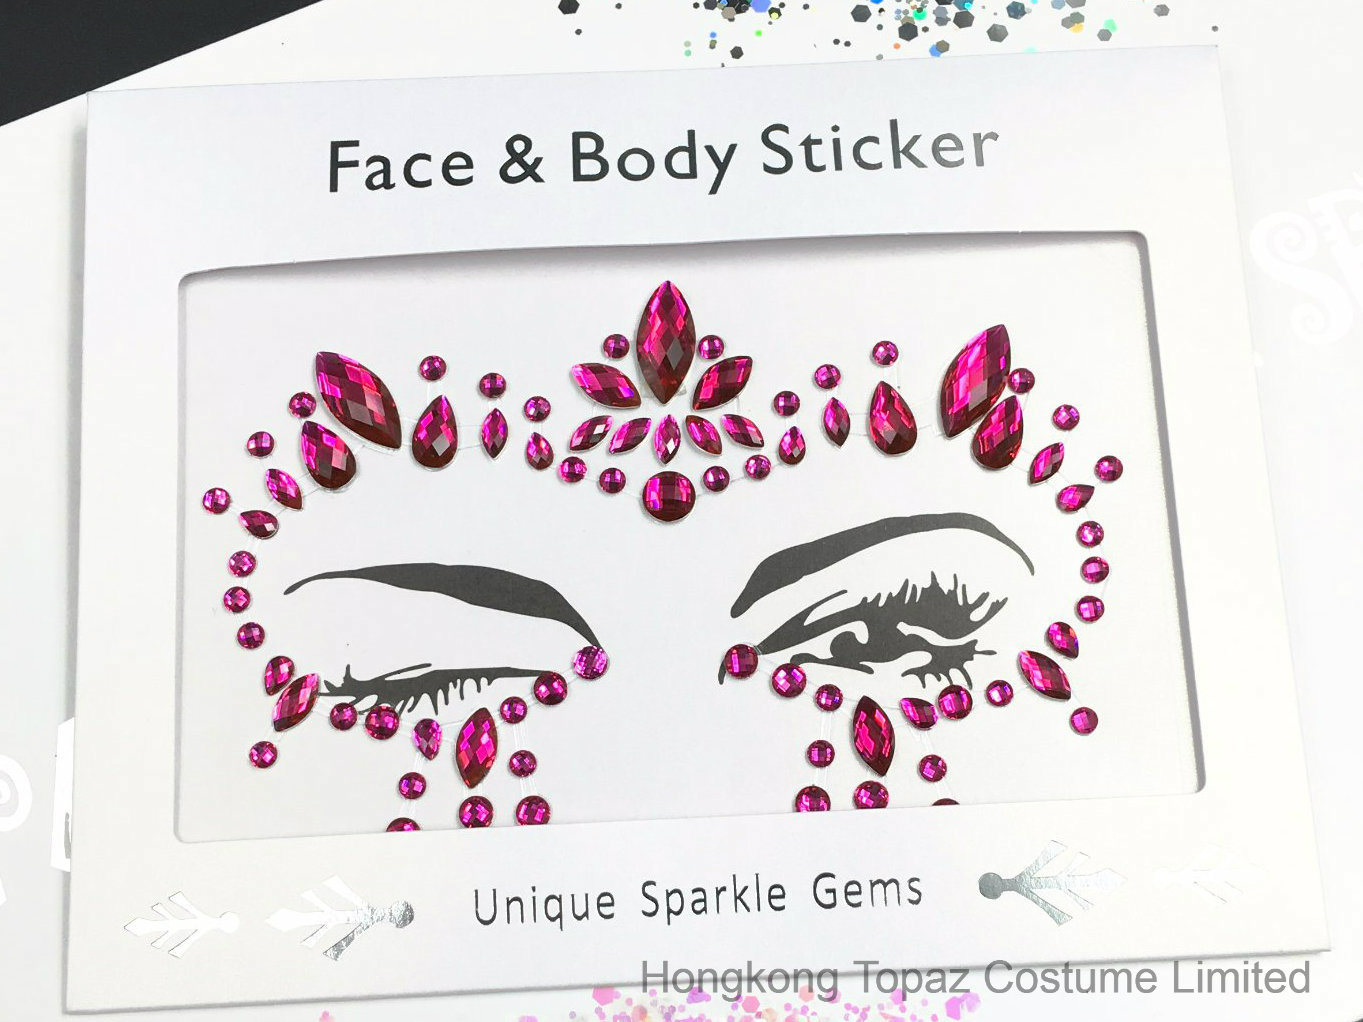 Sparkle custom fashion adhesive body jewelry face gem stickers sr 07